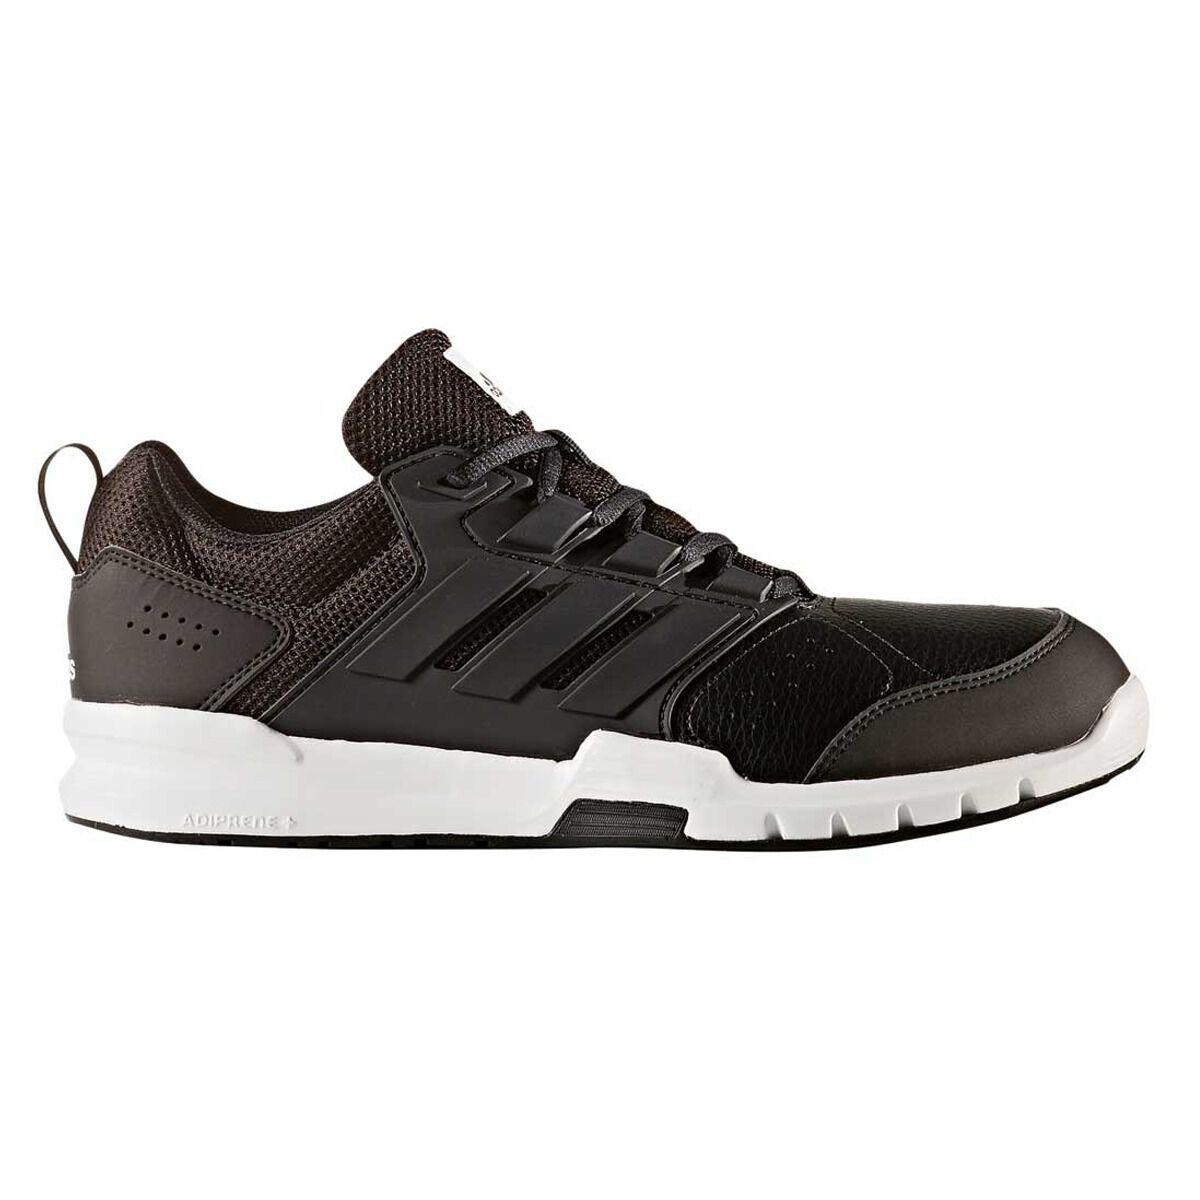 adidas galaxy mens running shoes black